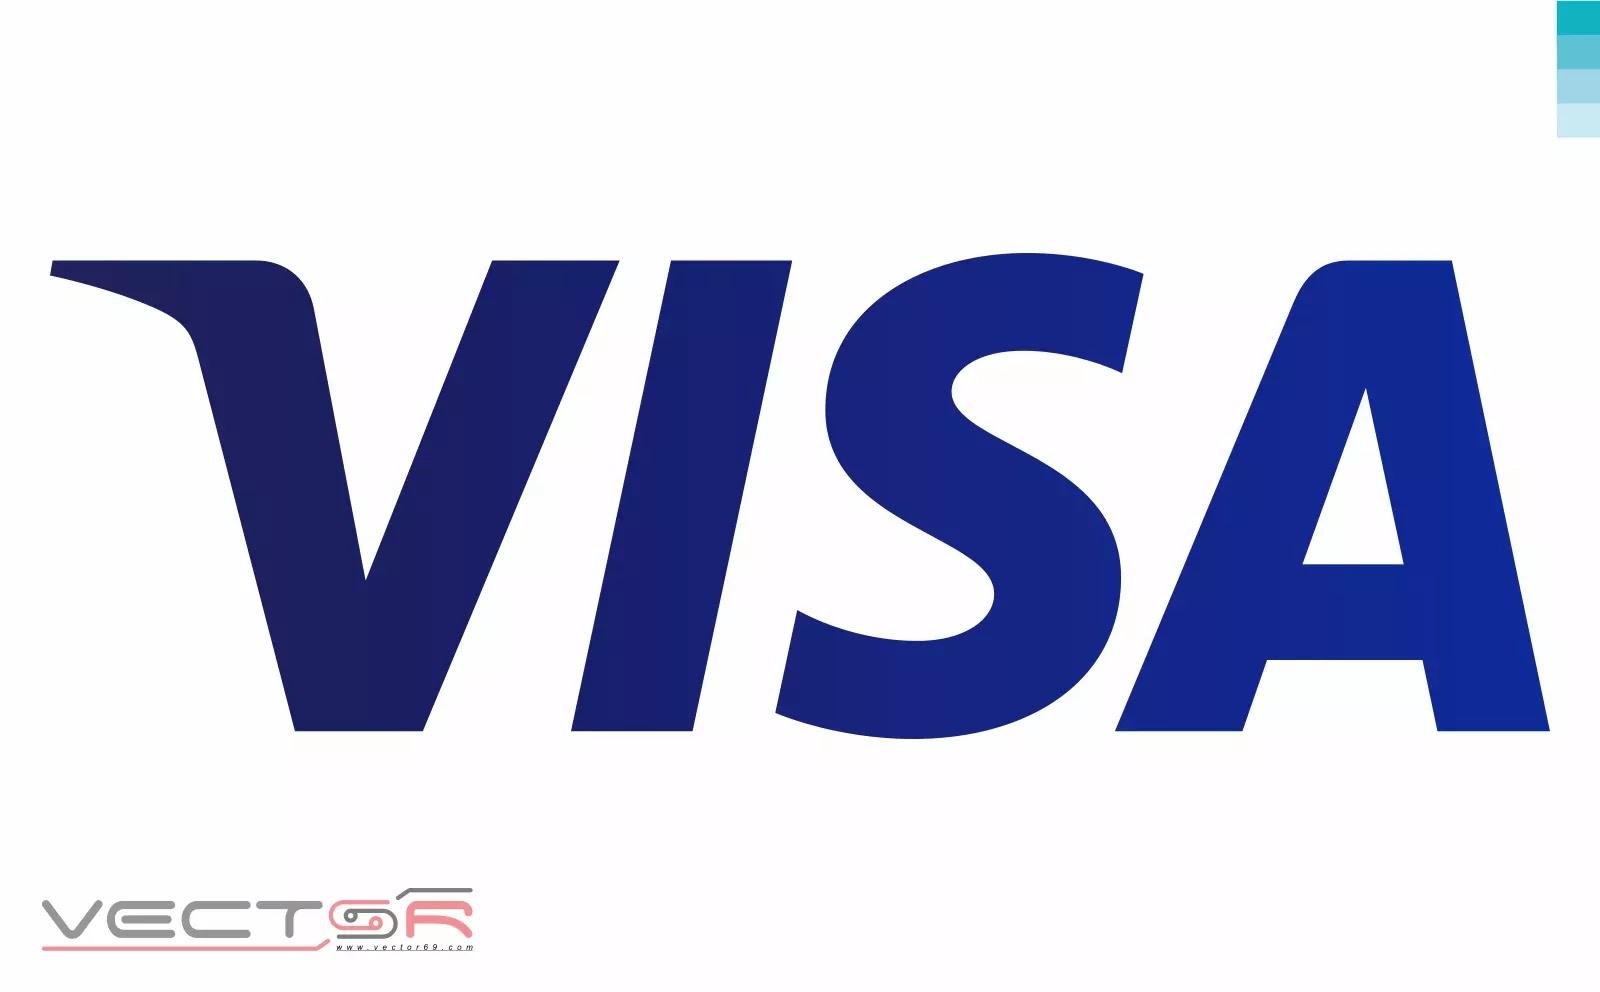 Visa (2014) Logo - Download Vector File SVG (Scalable Vector Graphics)